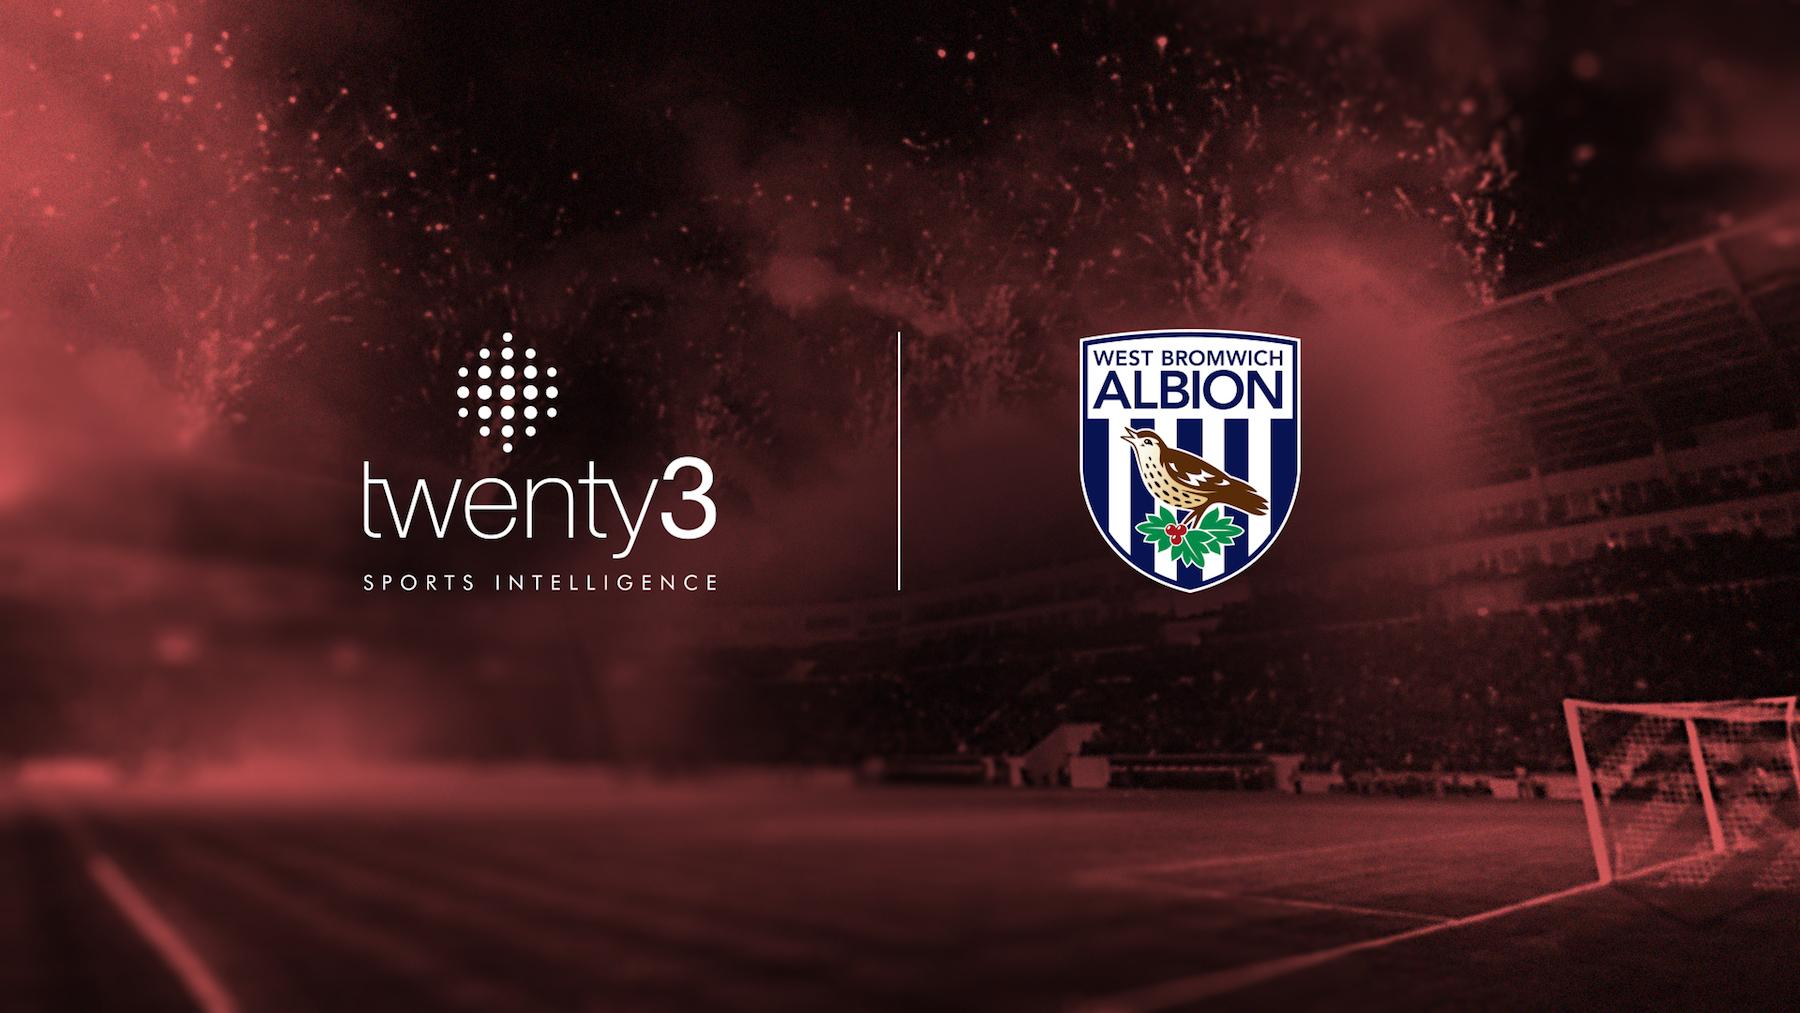 Twenty3 announce partnership with West Bromwich Albion